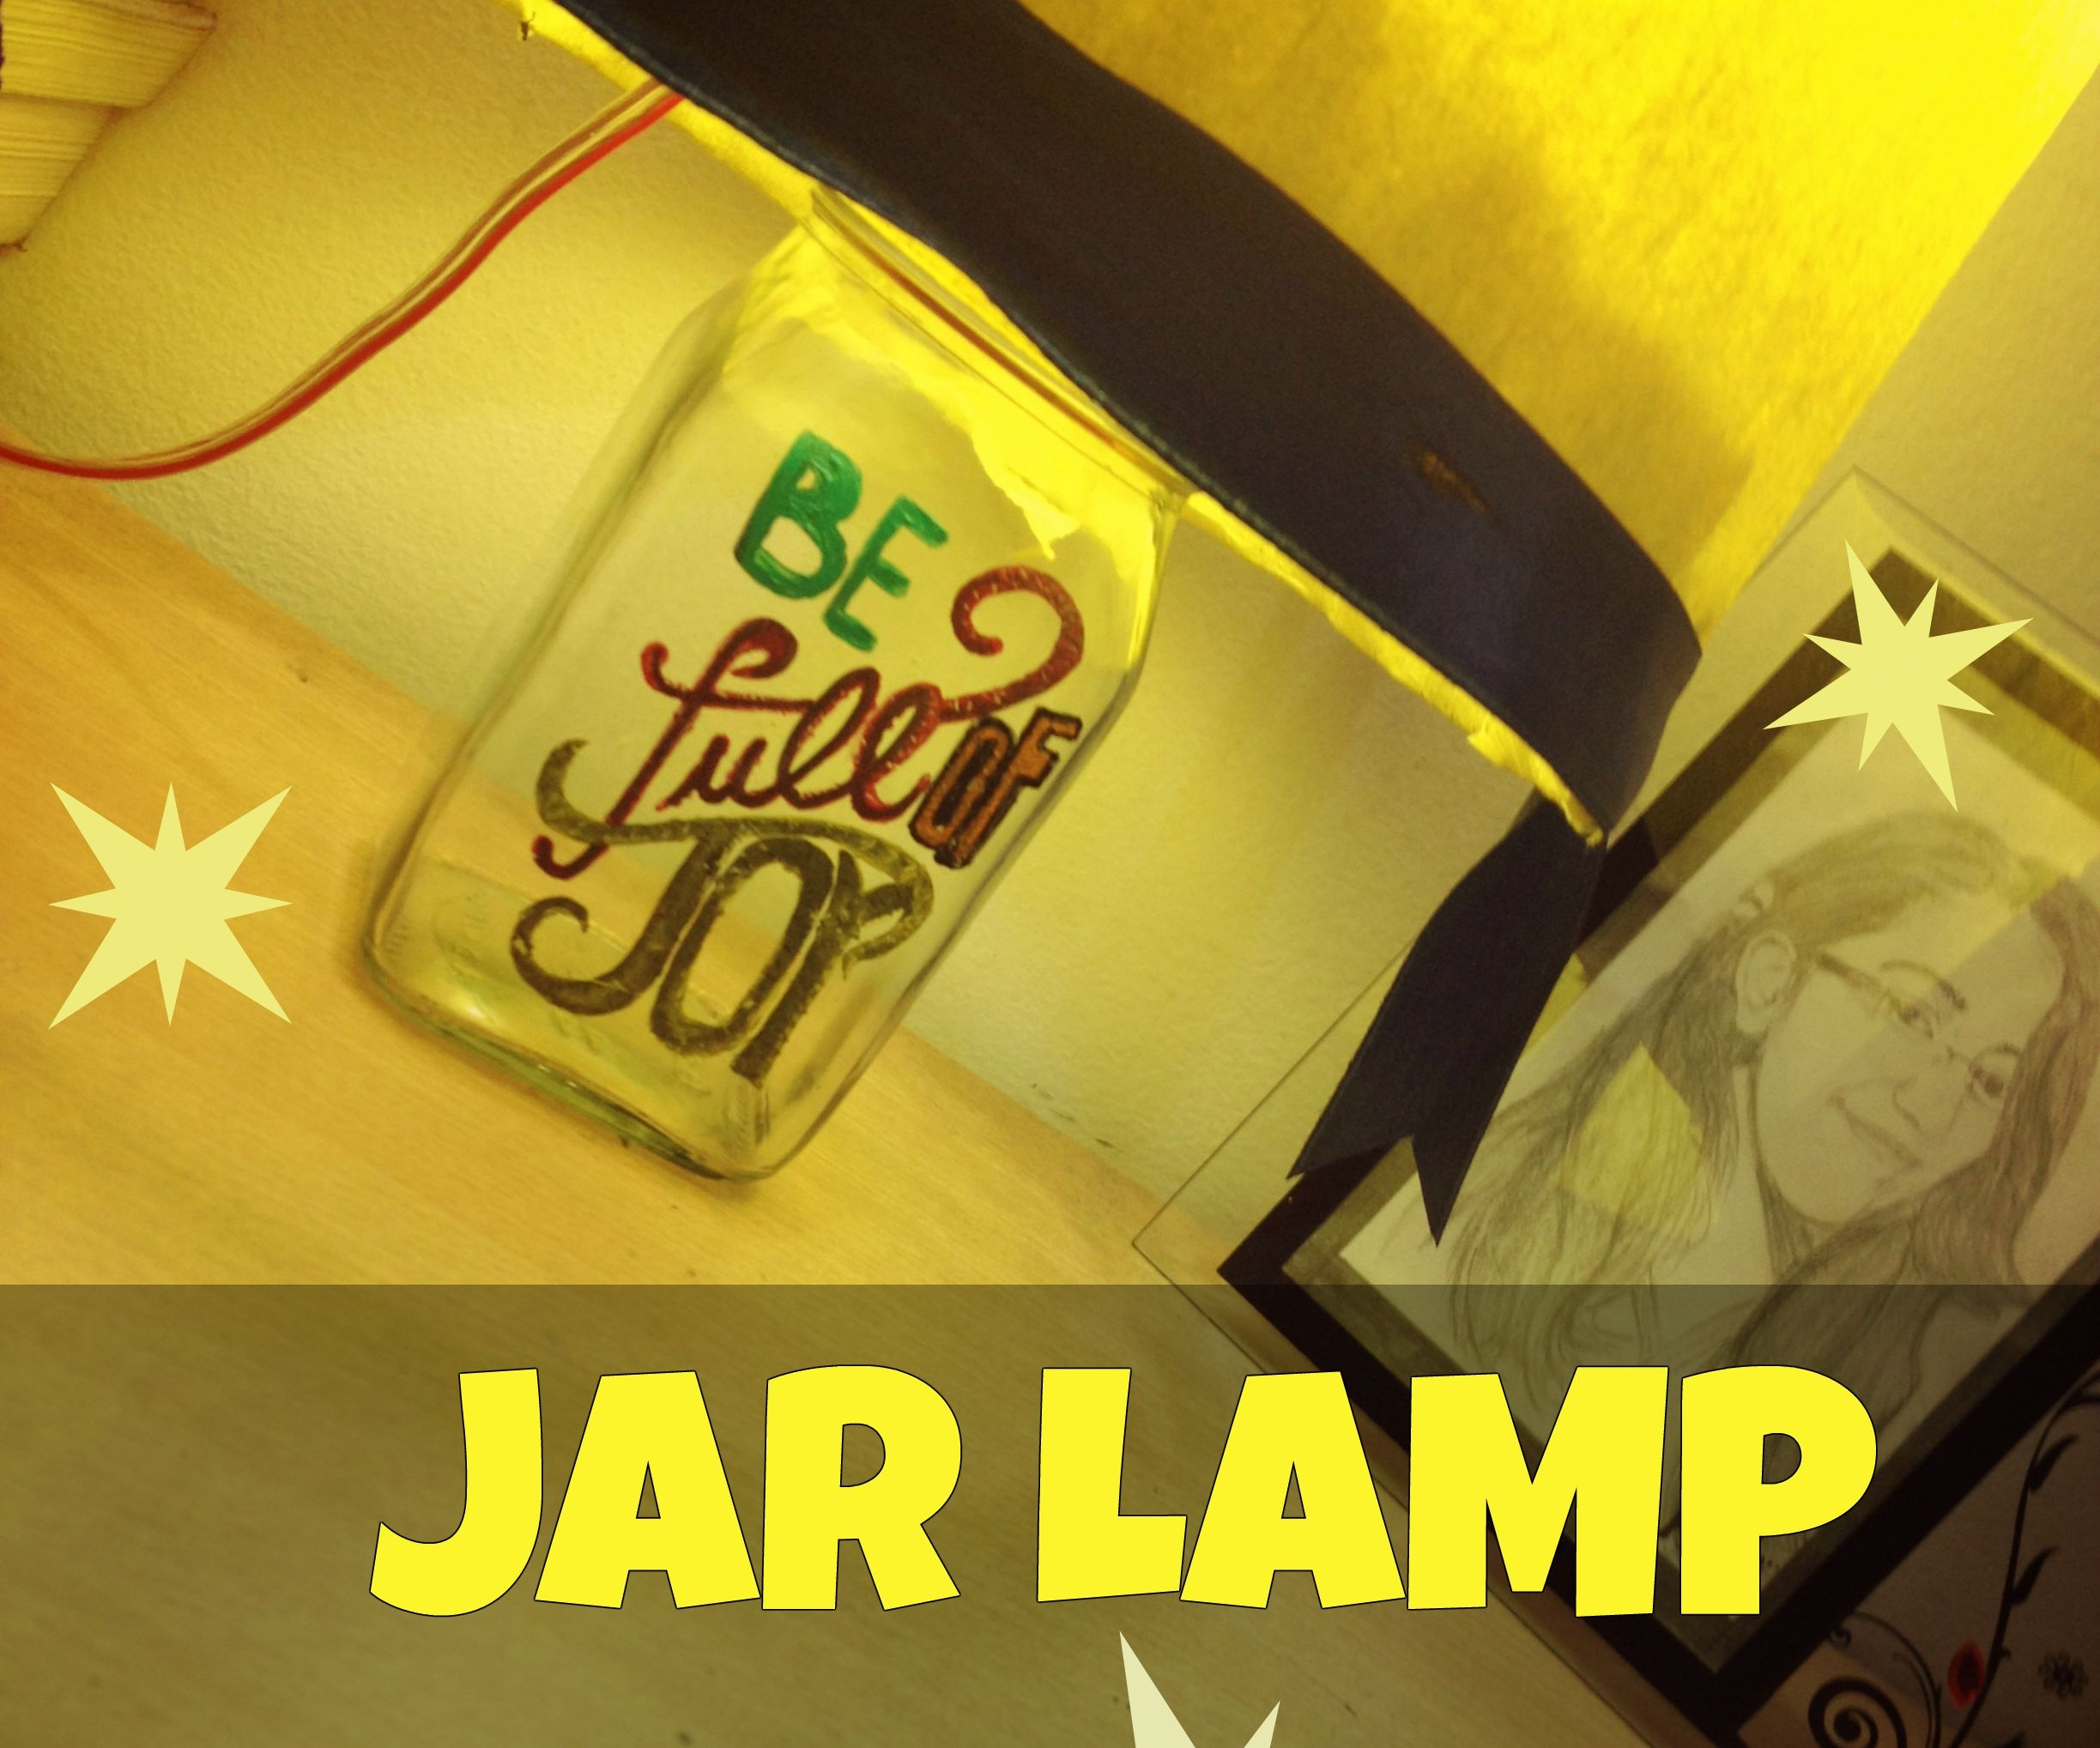 Hand-Painted Jar Lamp